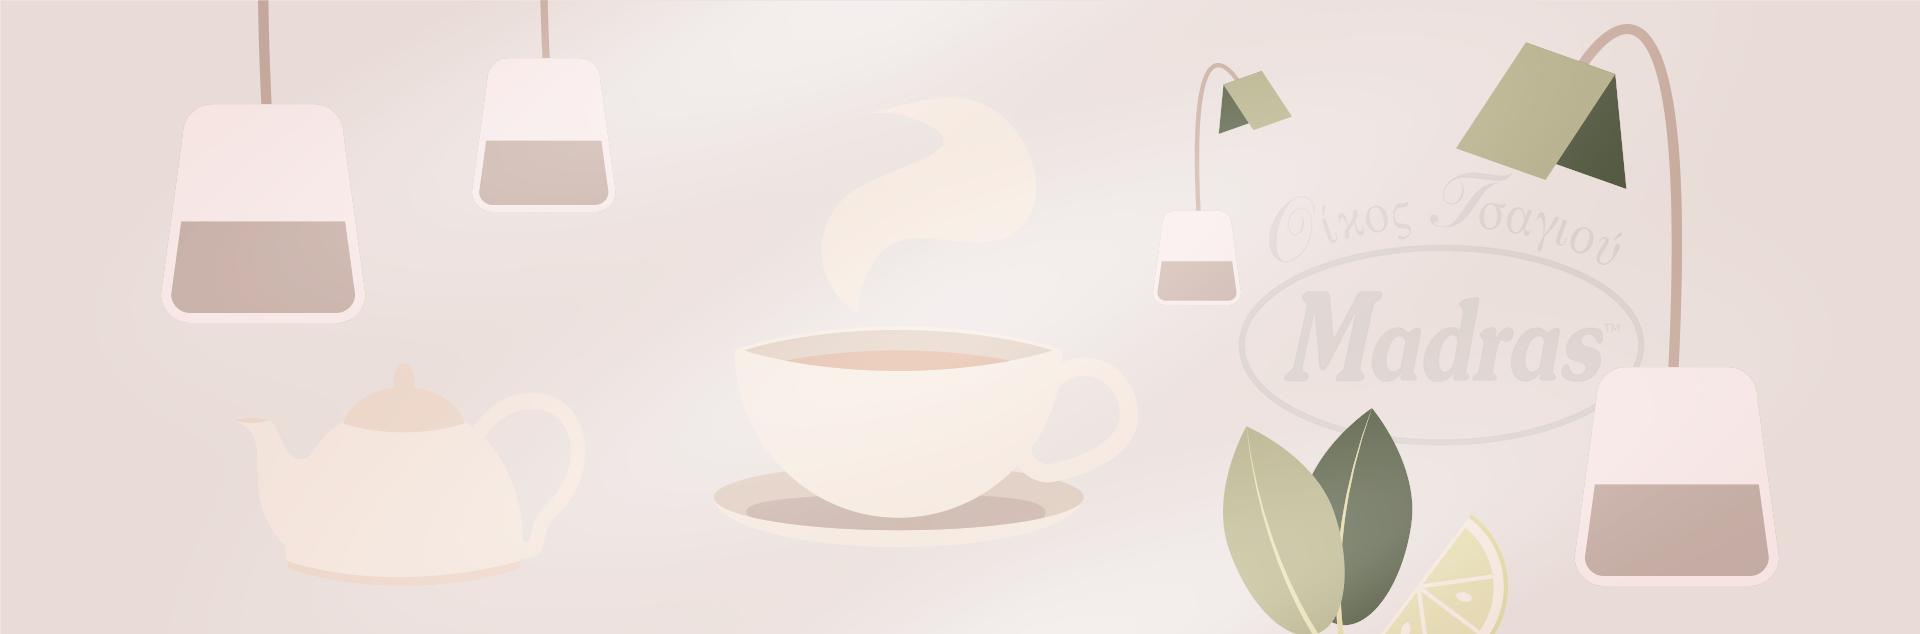 madras - tea separator